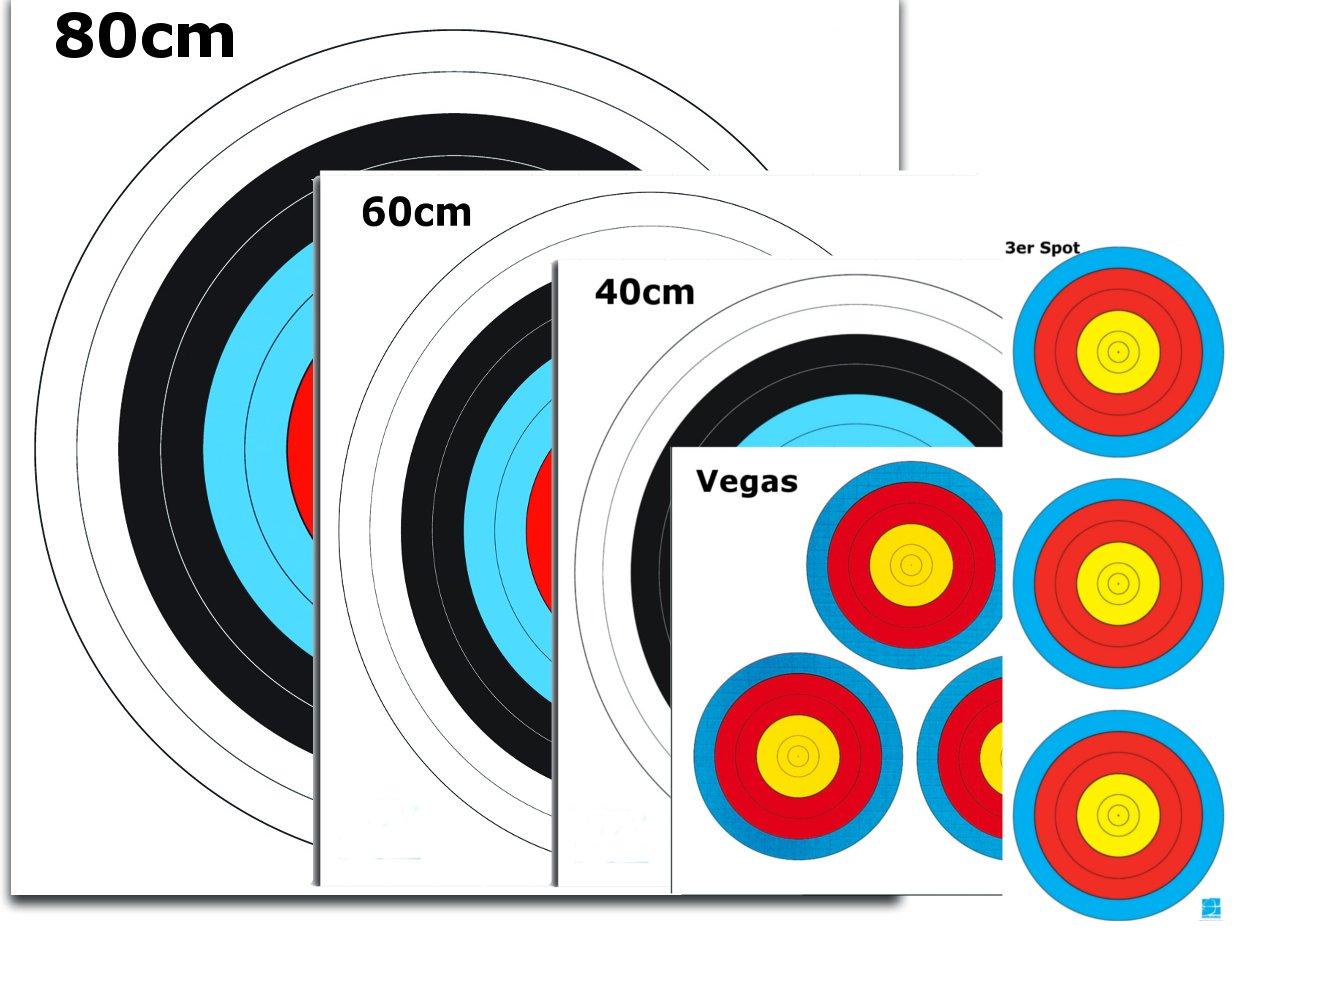 Wa Archery Target Pads Mix of 5Different Sized 4Panel Nails est-bogensport